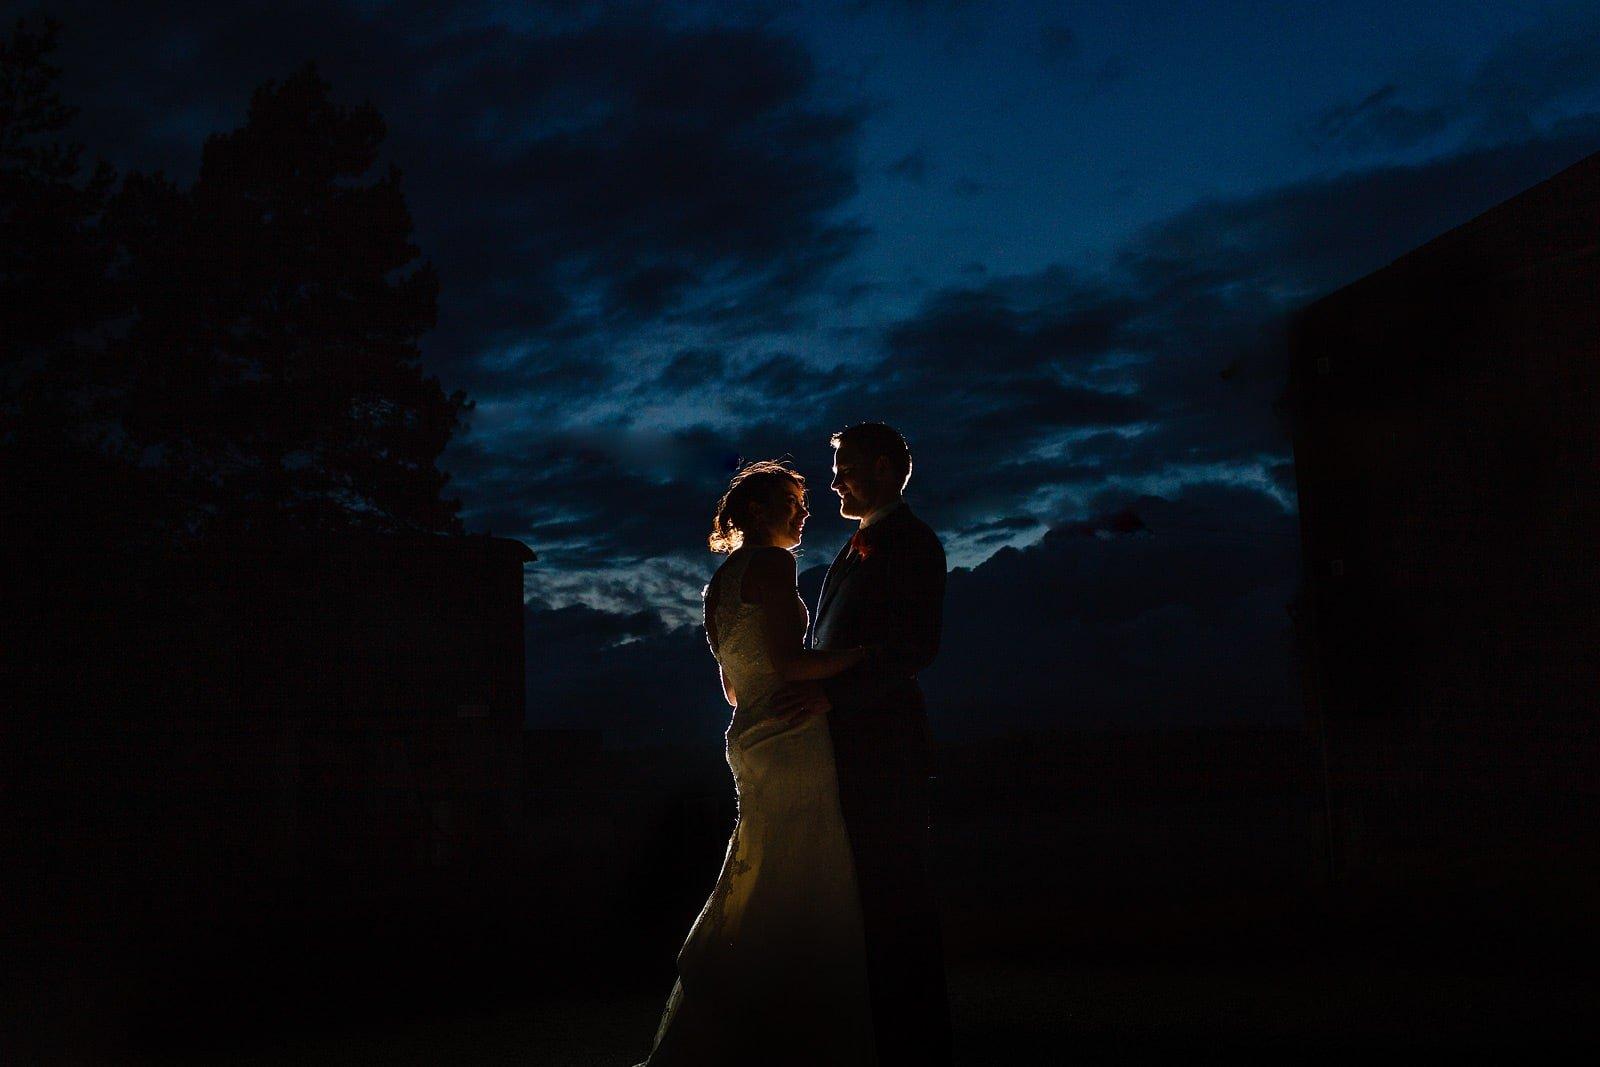 Smeetham Hall Barn wedding photography | Just One